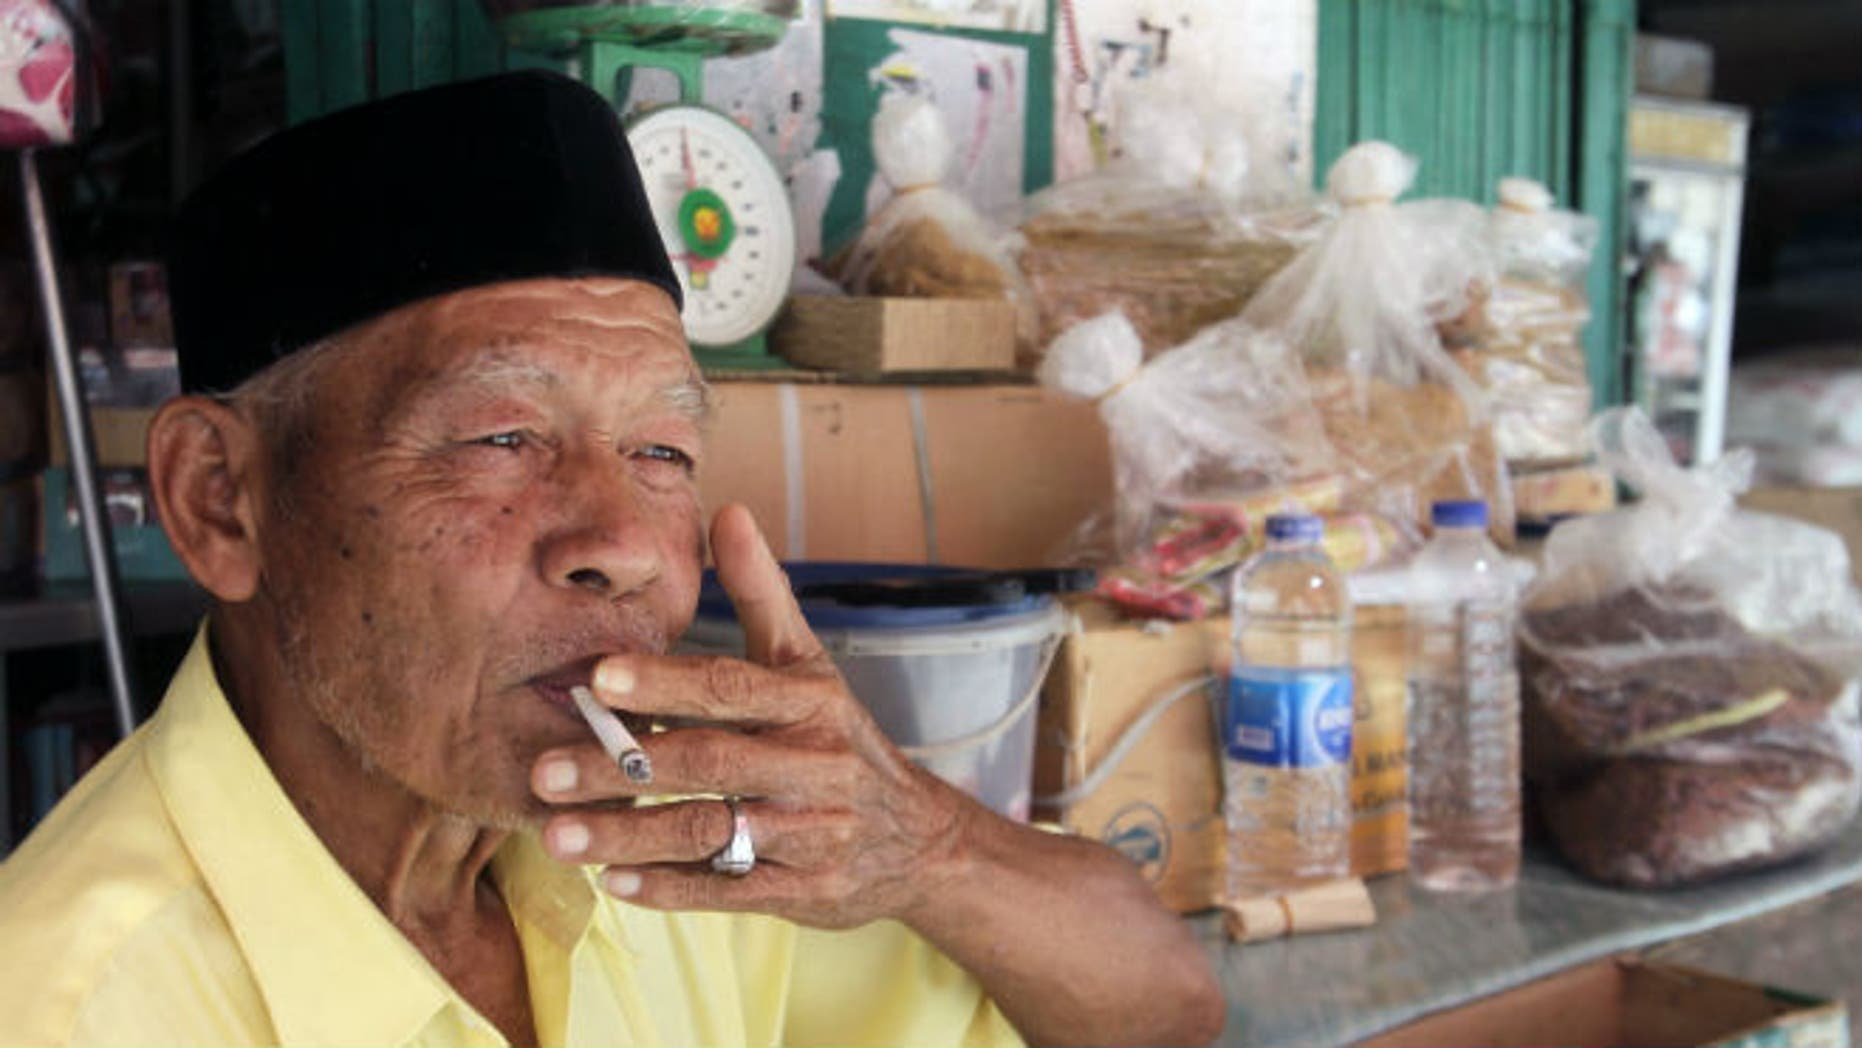 A vendor of locally grown tobacco smokes a cigarette in a market in Indonesia. (REUTERS/Junaidi Hanafiah)